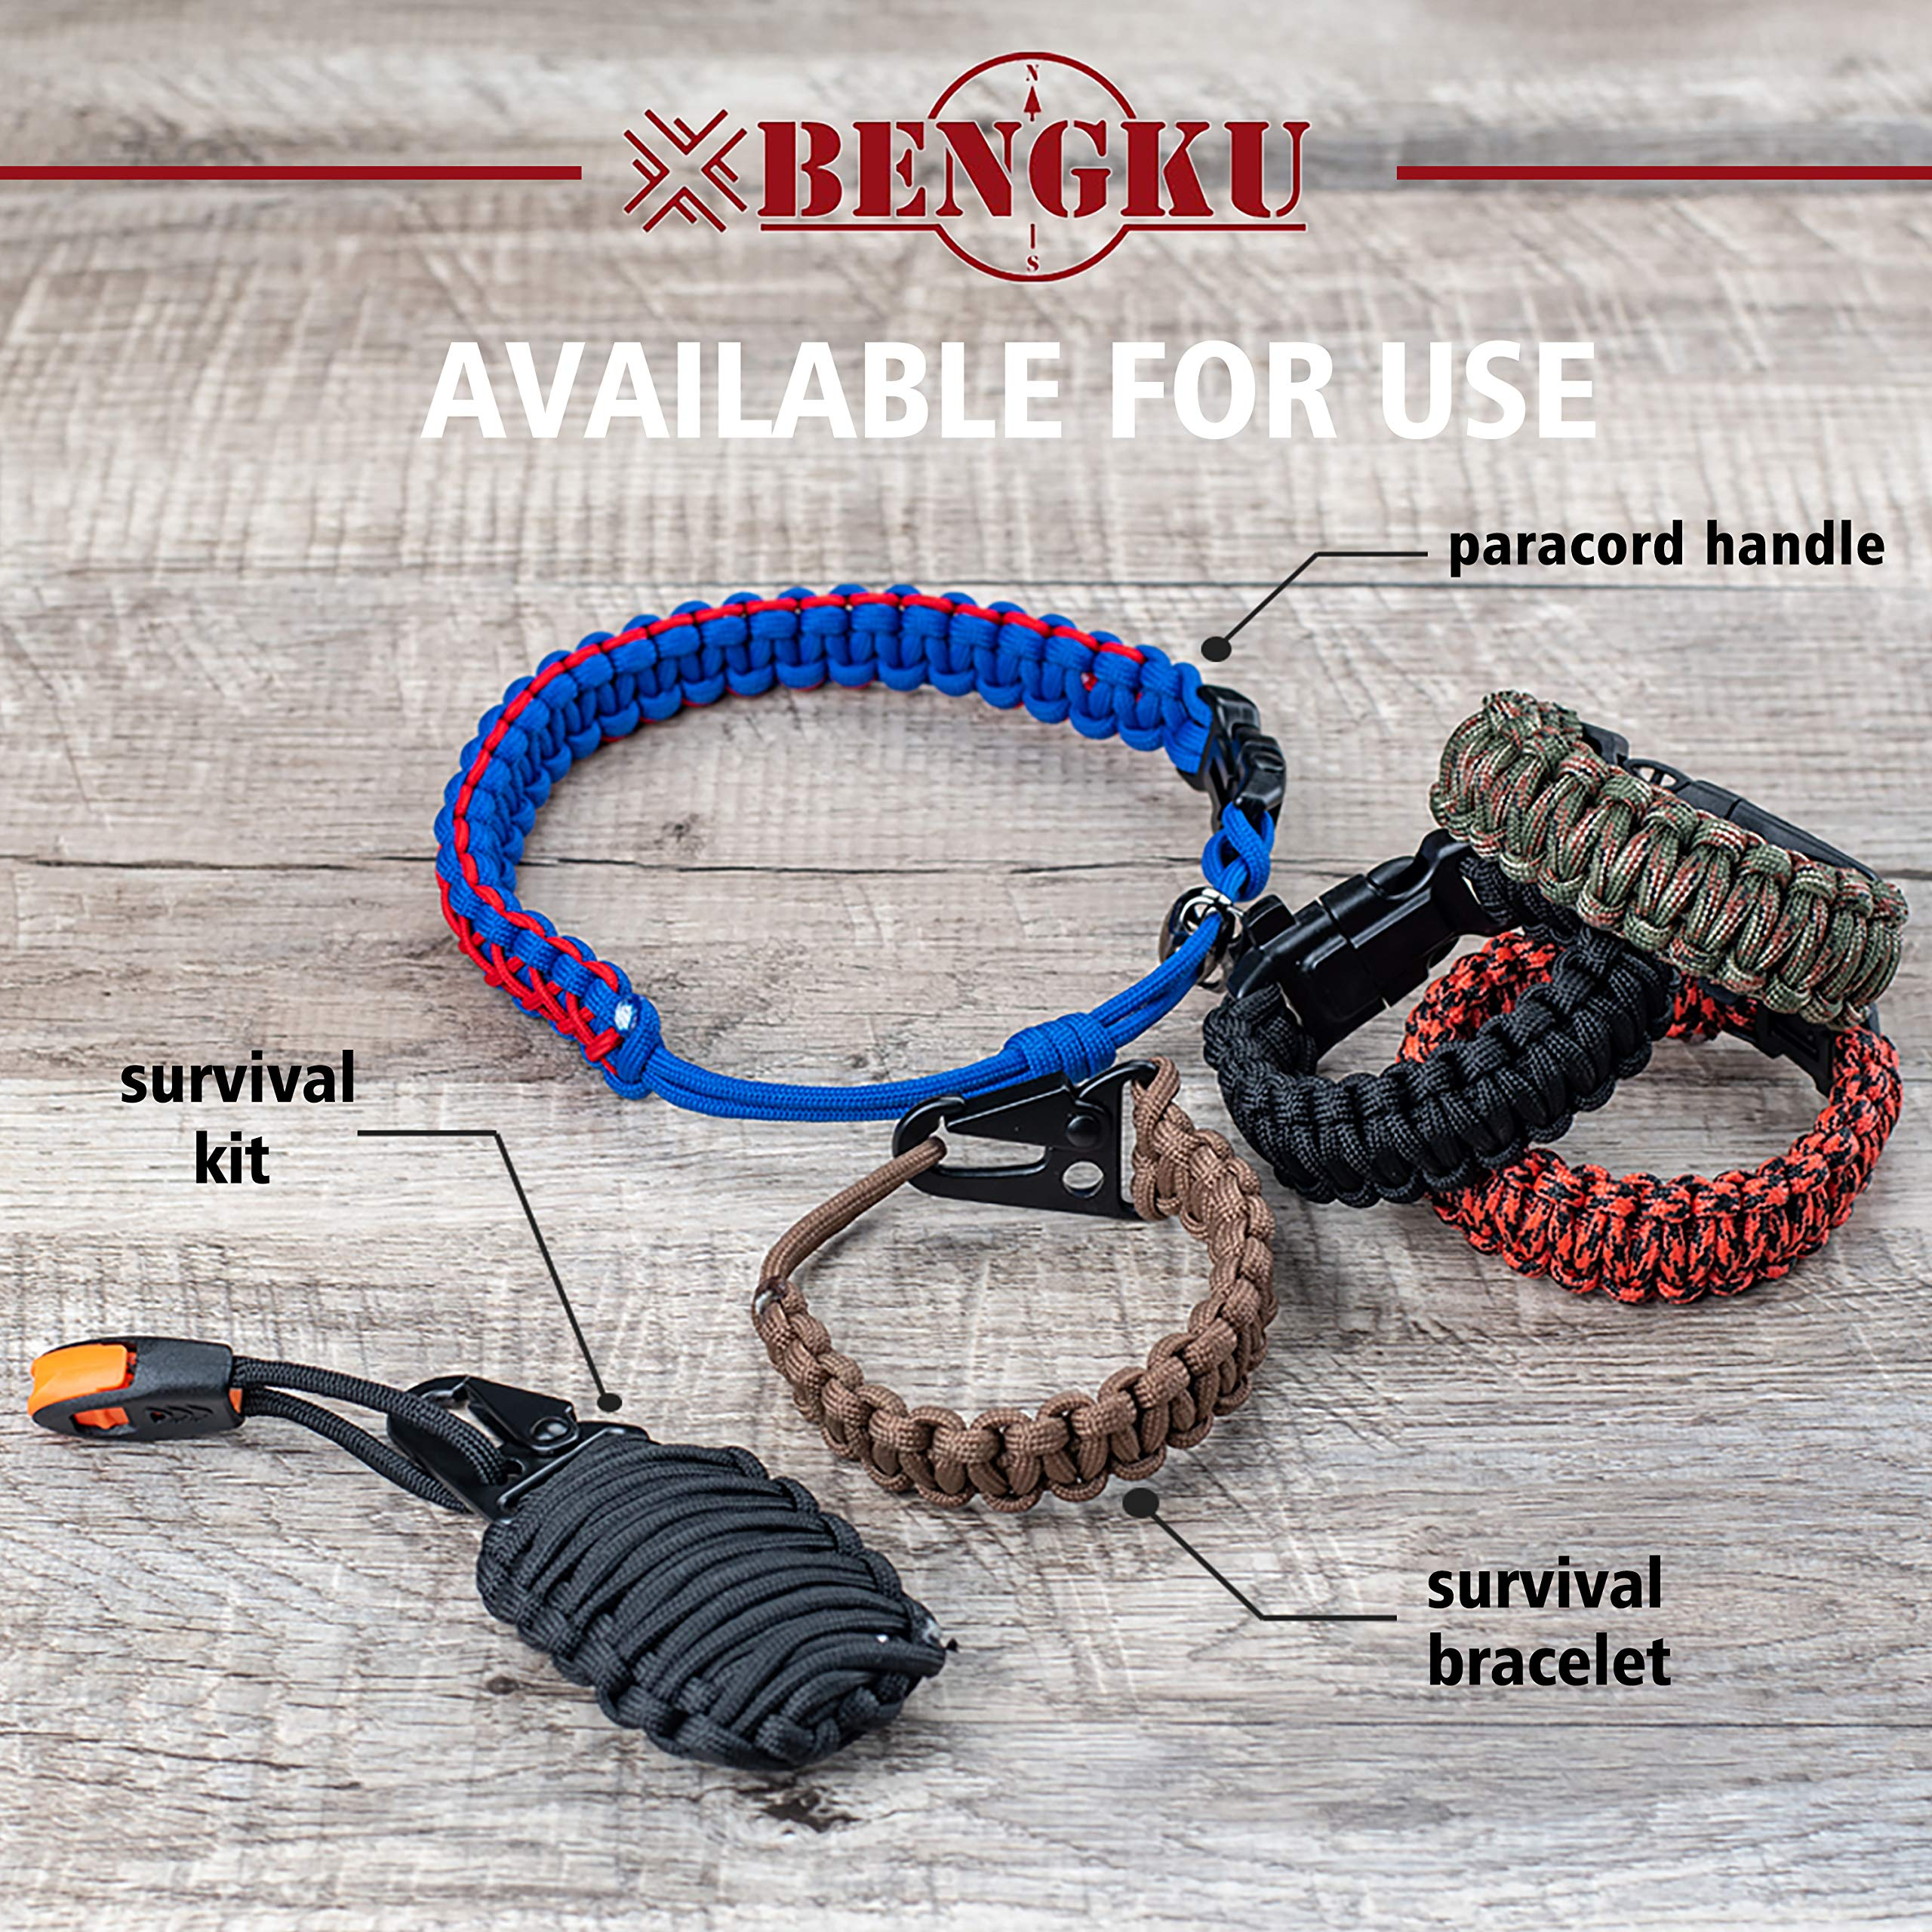 BENGKU Outdoor Survival Mil-SPEC 550lb Paracord/Parachute Cord(MIl-C-5040-H),100Feet,100% Nylon. (Black, 100) by BENGKU (Image #6)